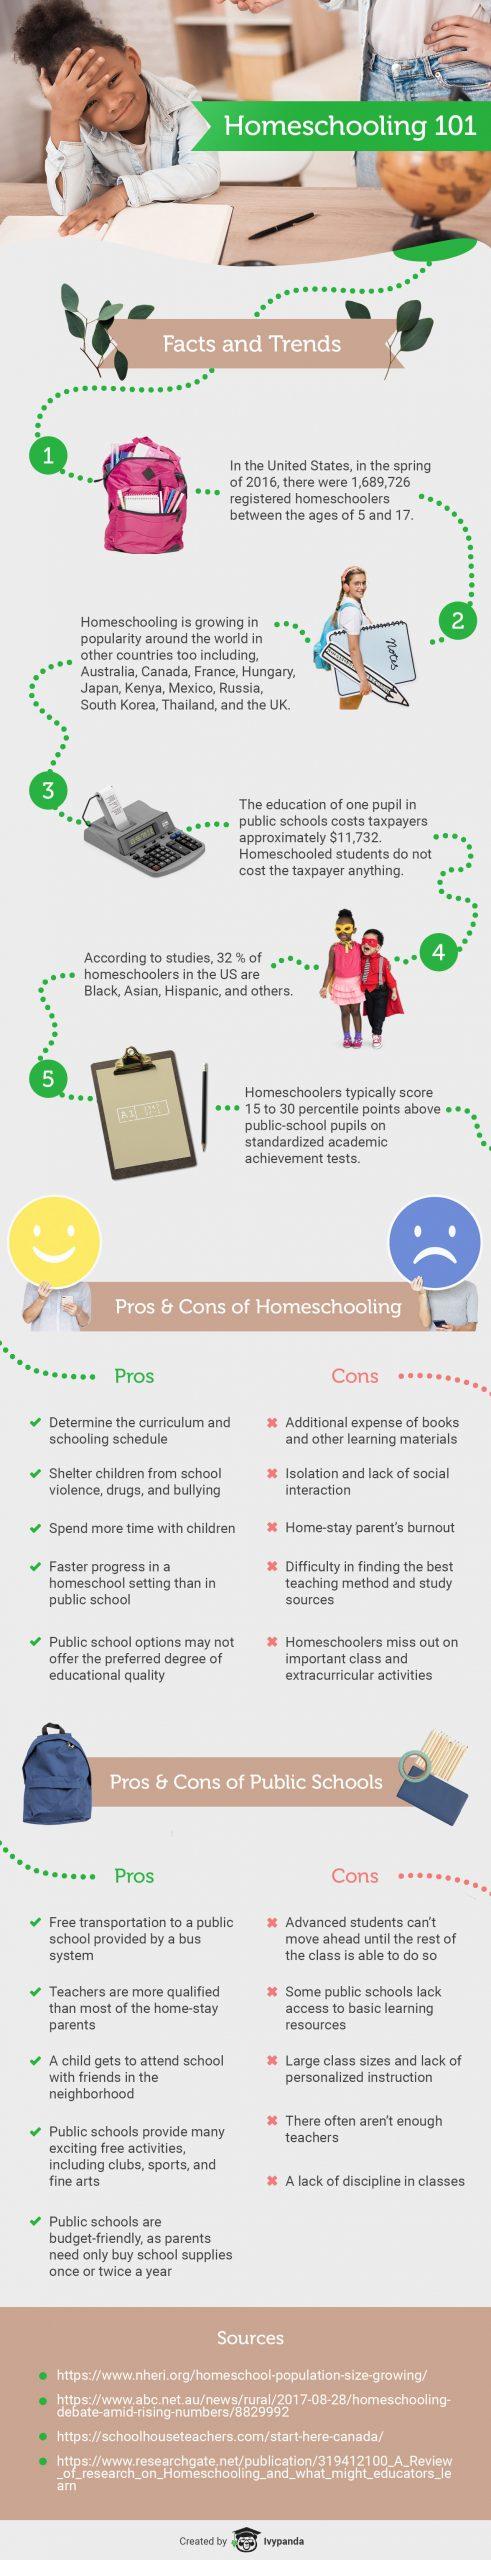 homeschooling infographic